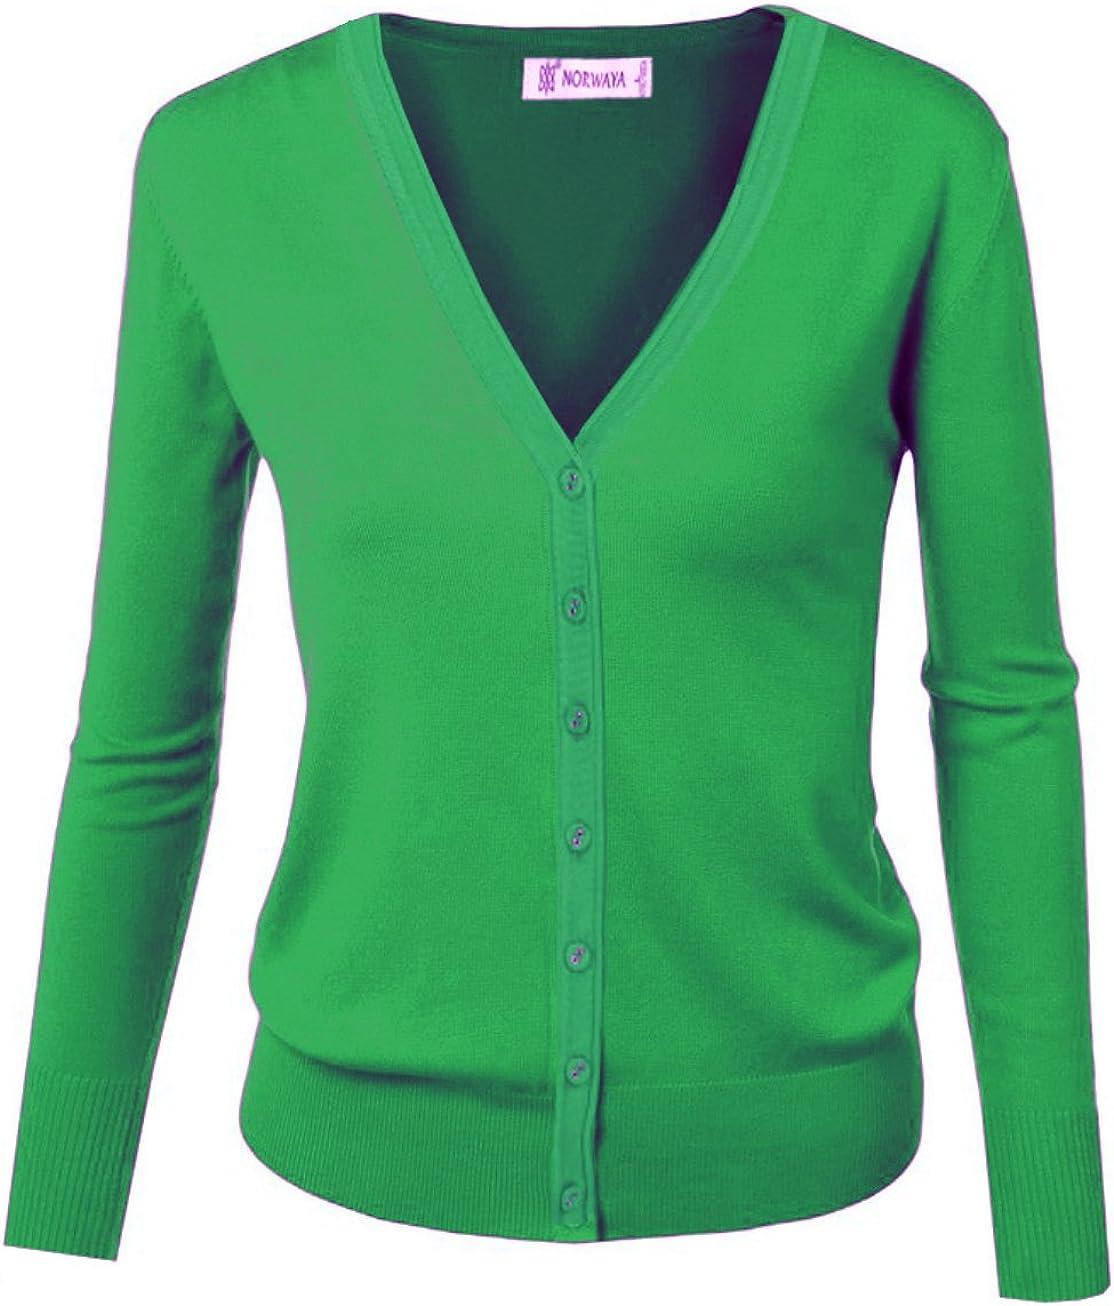 GOLDSTITCH Women Long Sleeve Button Down Soft Knit Cardigan Sweater